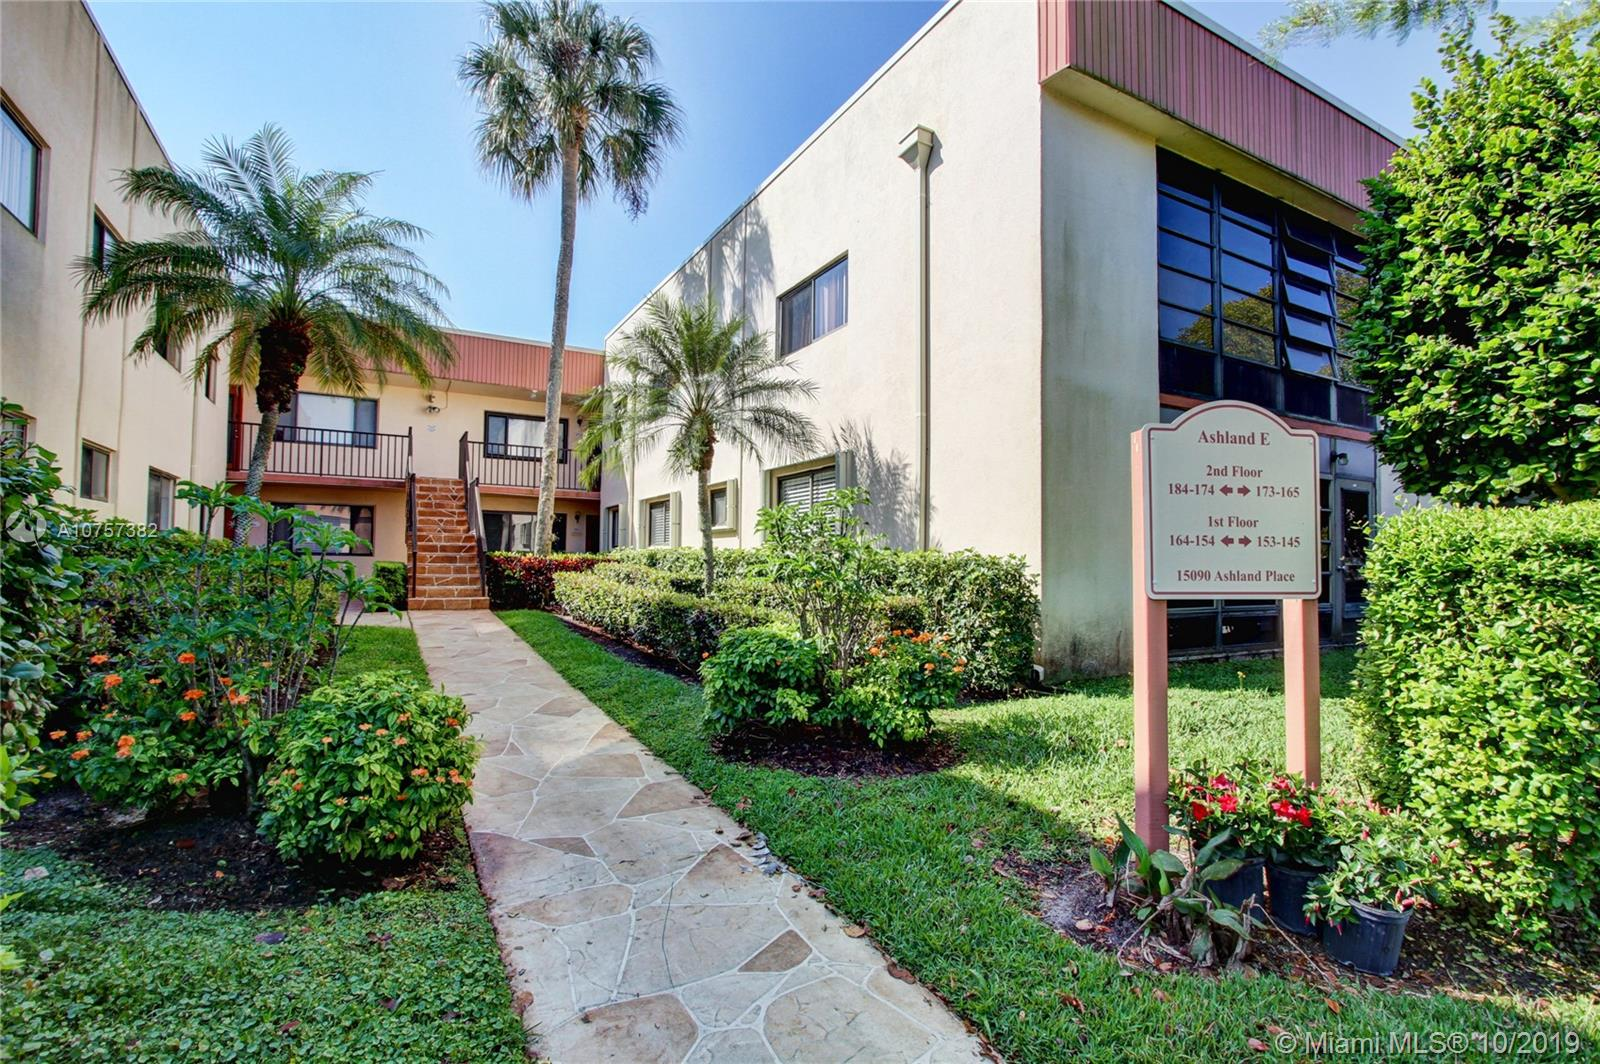 Property for sale at 15090 Ashland Pl # 168, Delray Beach FL 33484 Unit 168, Delray Beach,  Florida 33484